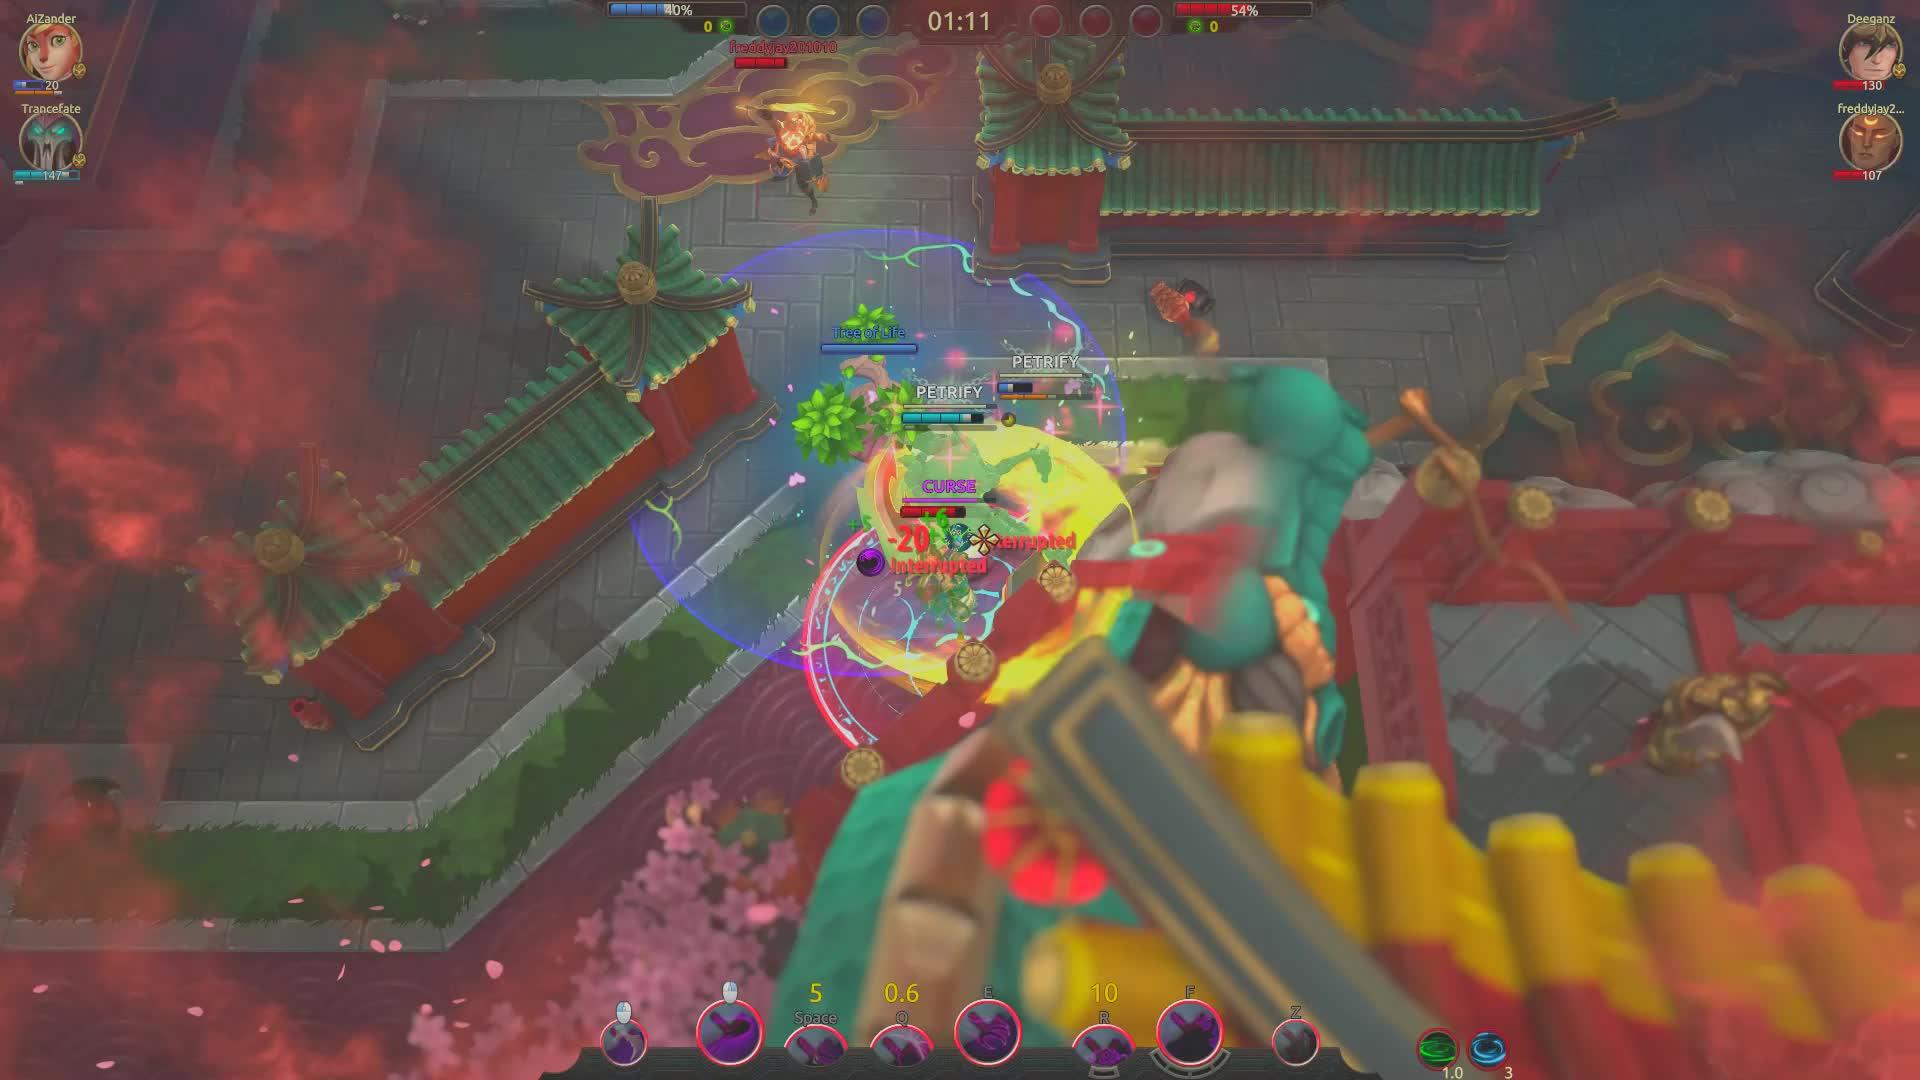 Battlerite 02.19.2018 - 17.44.36.14.DVRTrim GIFs